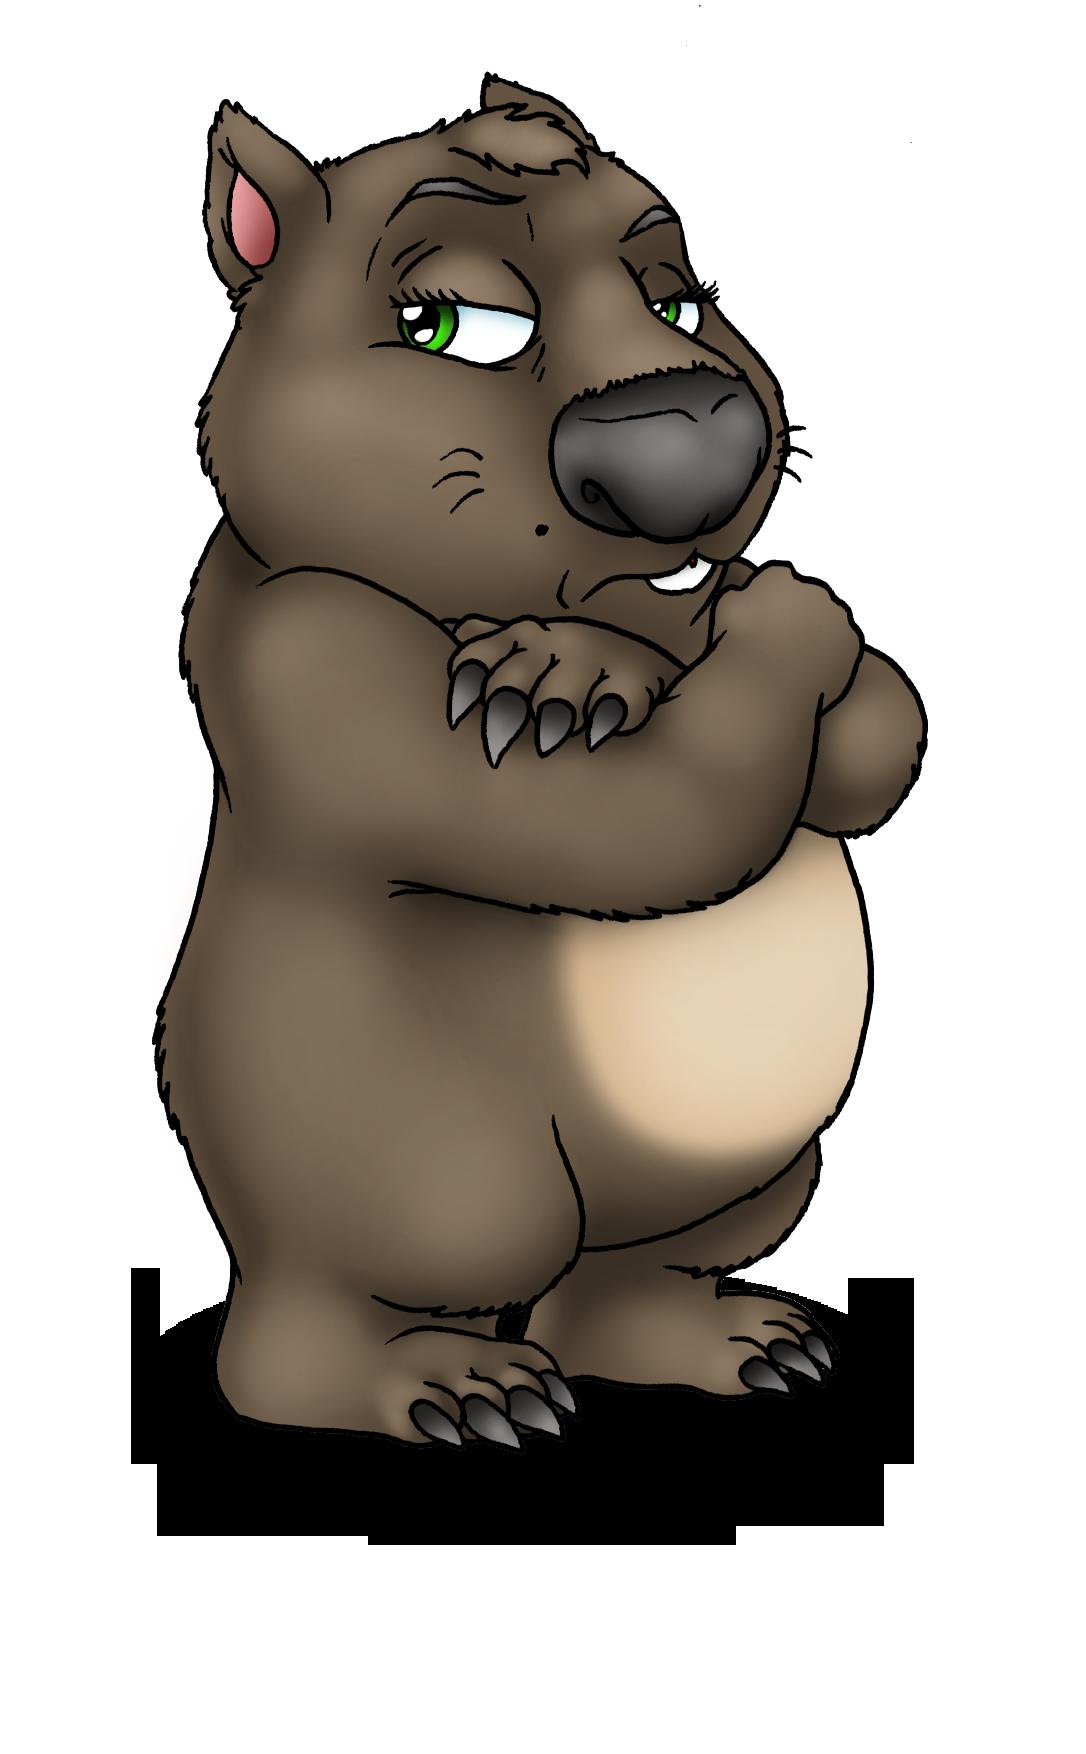 Koala clipart wombat. Special guest interview grumpy